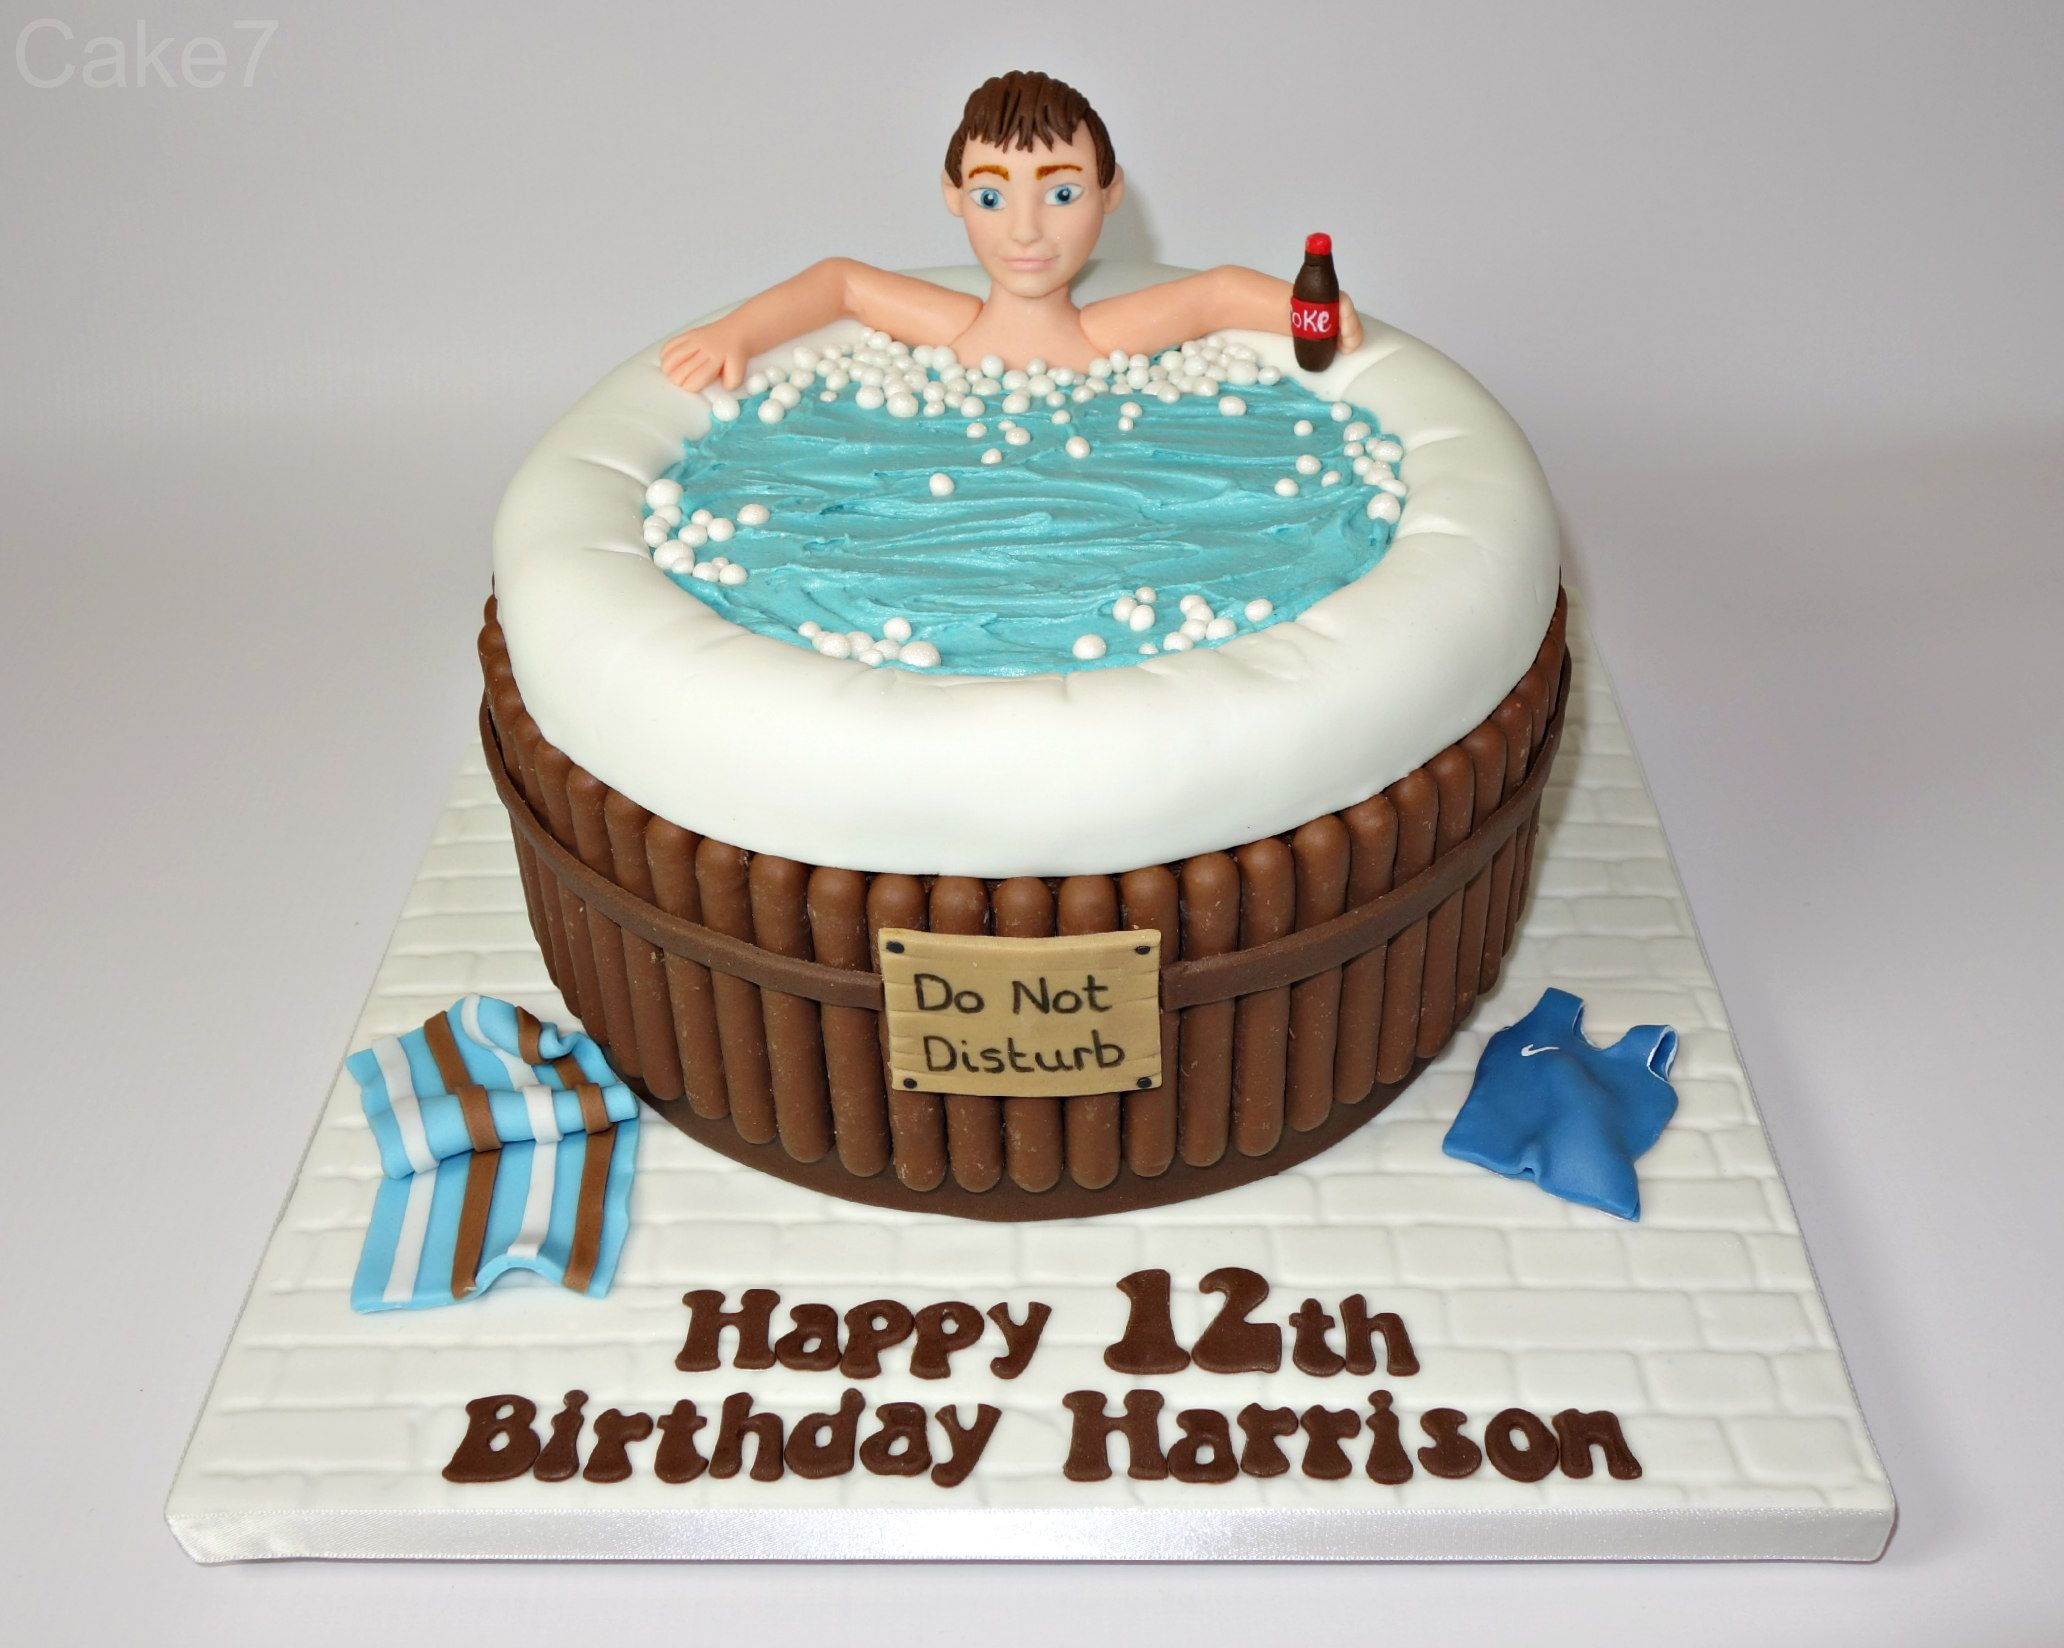 Hot Tub Cake Www Cakeseven Wix Facebook Cake7 Twitter Cake7